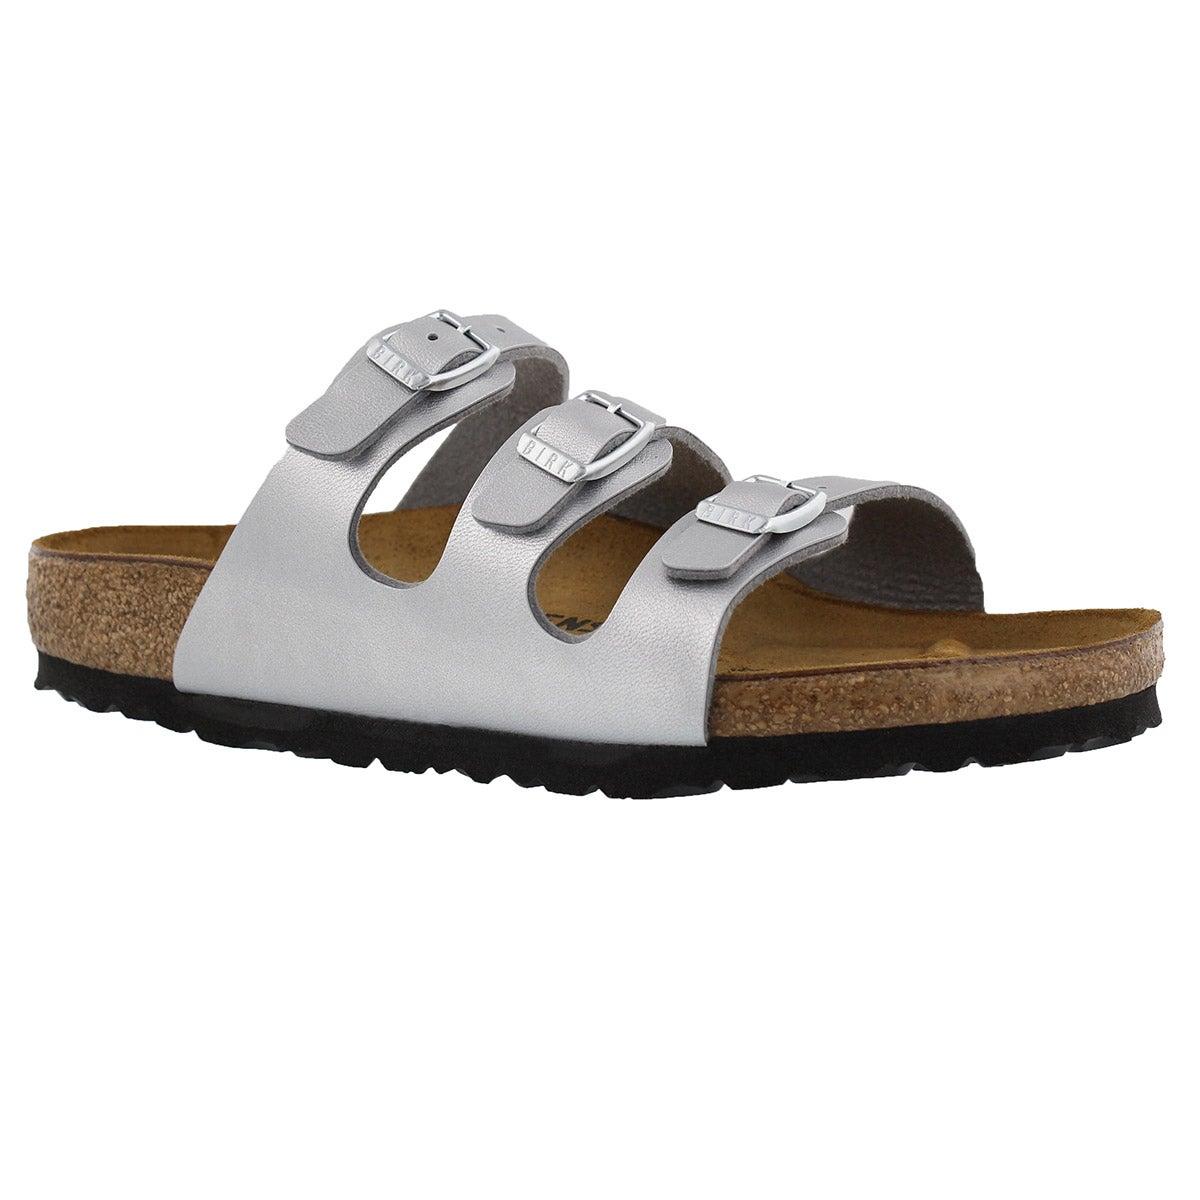 Women's FLORIDA silver BF 3 strap sandals